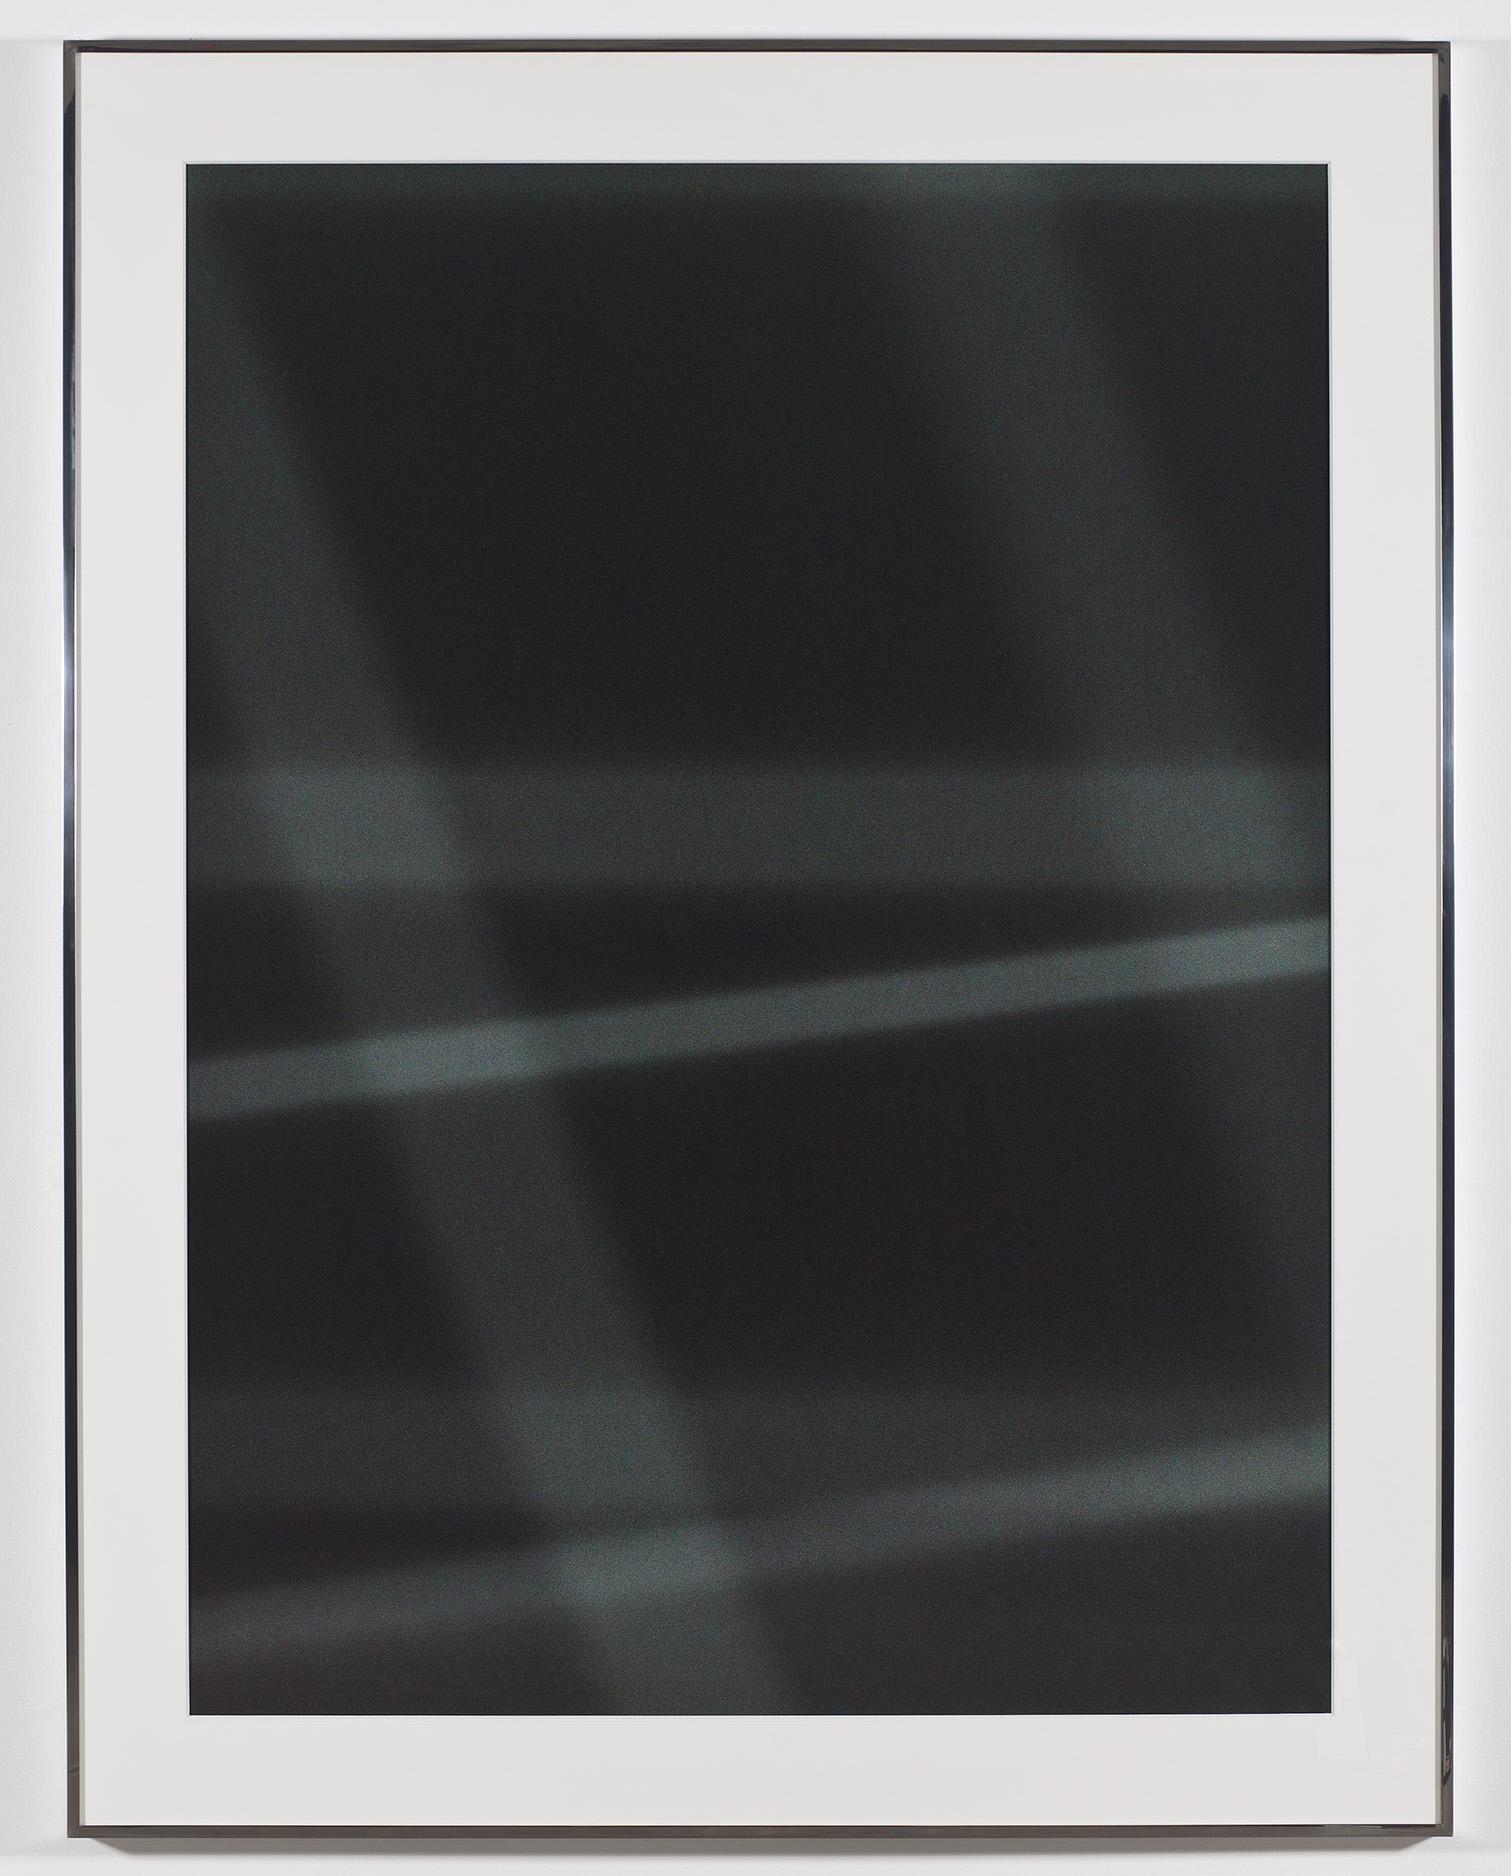 Transparency (Negative) [Kodak Portra 160NC Em. No. 3161: July 3–7, 2010 LAX/IAD/FRA/BLQ BLQ/BRU/ORD/LAX]    2011   Epson Ultrachrome K3 archival ink jet print on Museo Silver Rag Paper  68 x 52 1/4 inches   Transparencies, 2008–2014